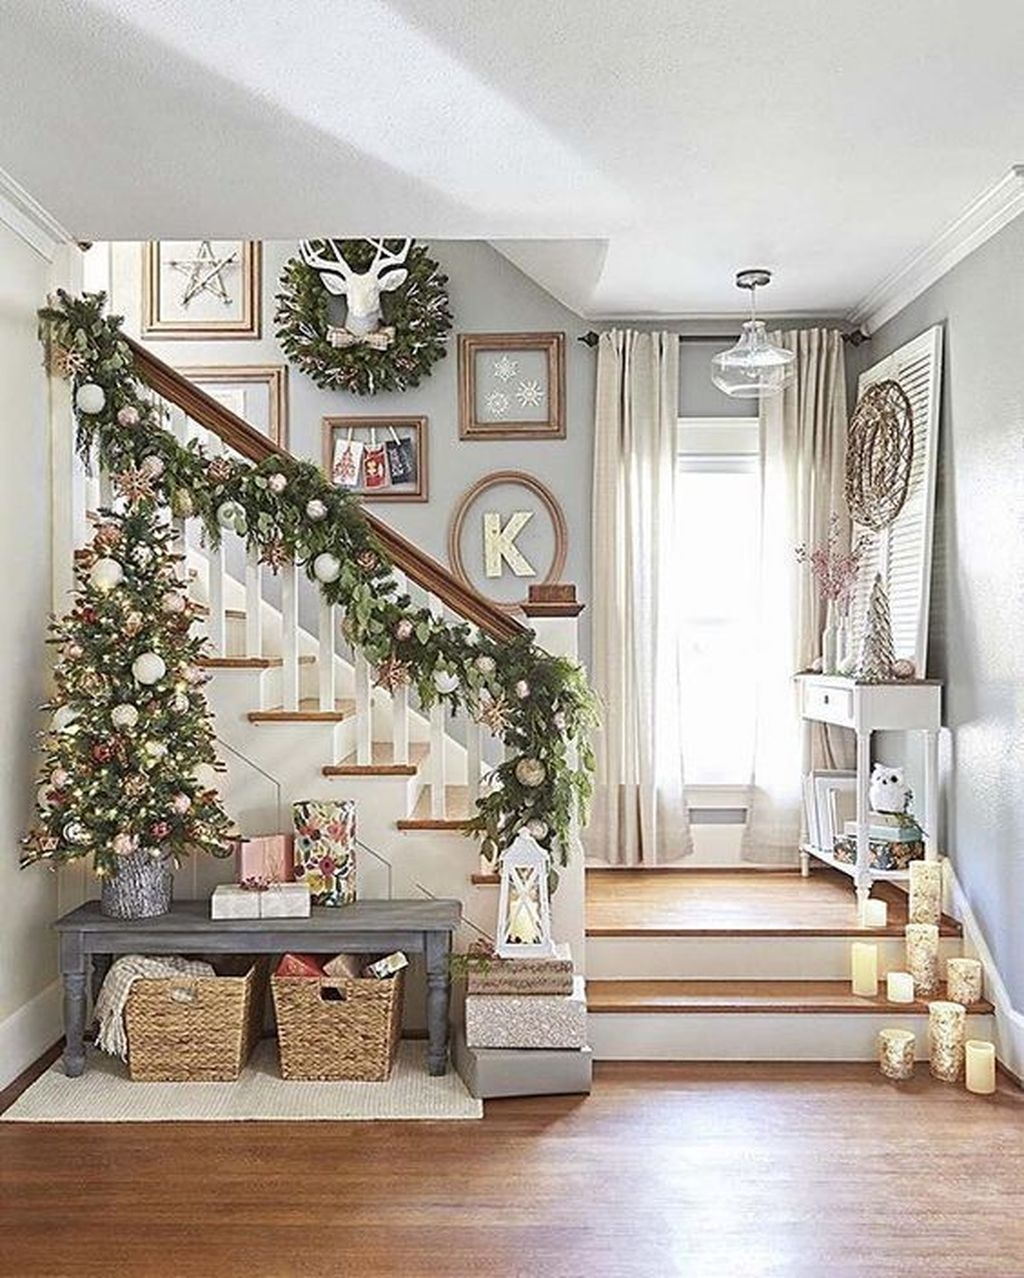 Unordinary Christmas Home Decor Ideas 38